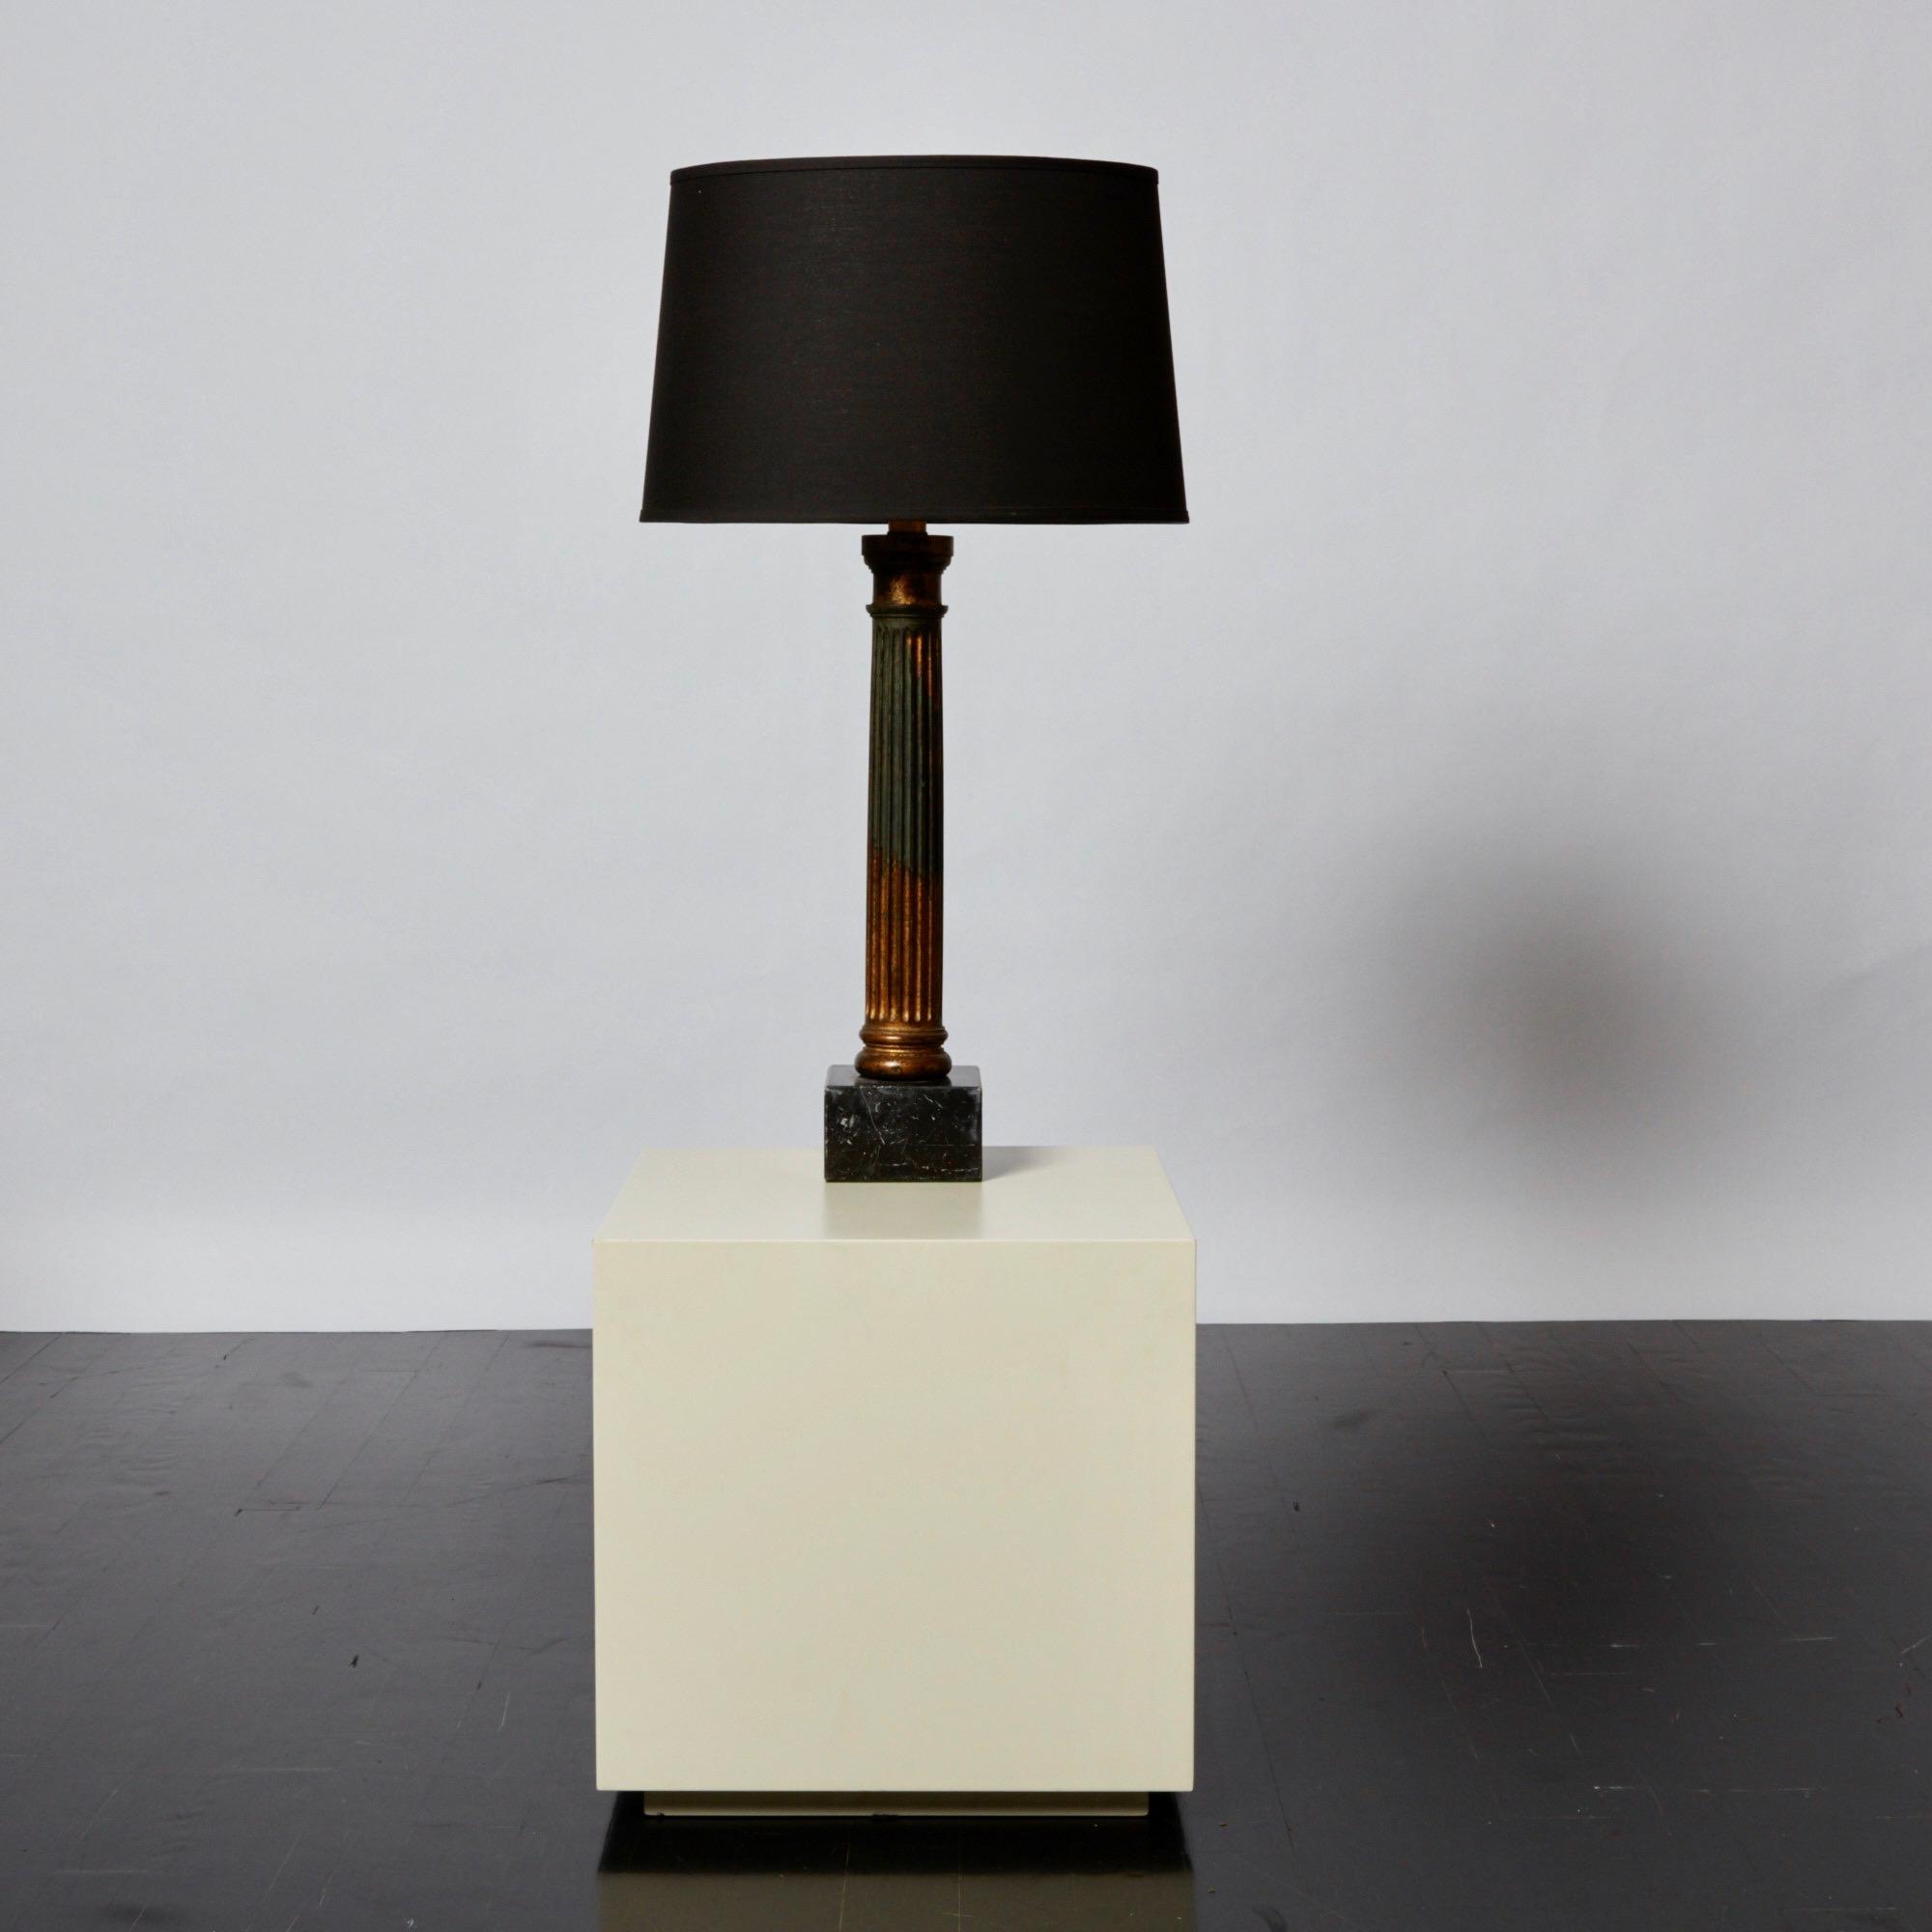 antony_todd_lamp_2.jpg